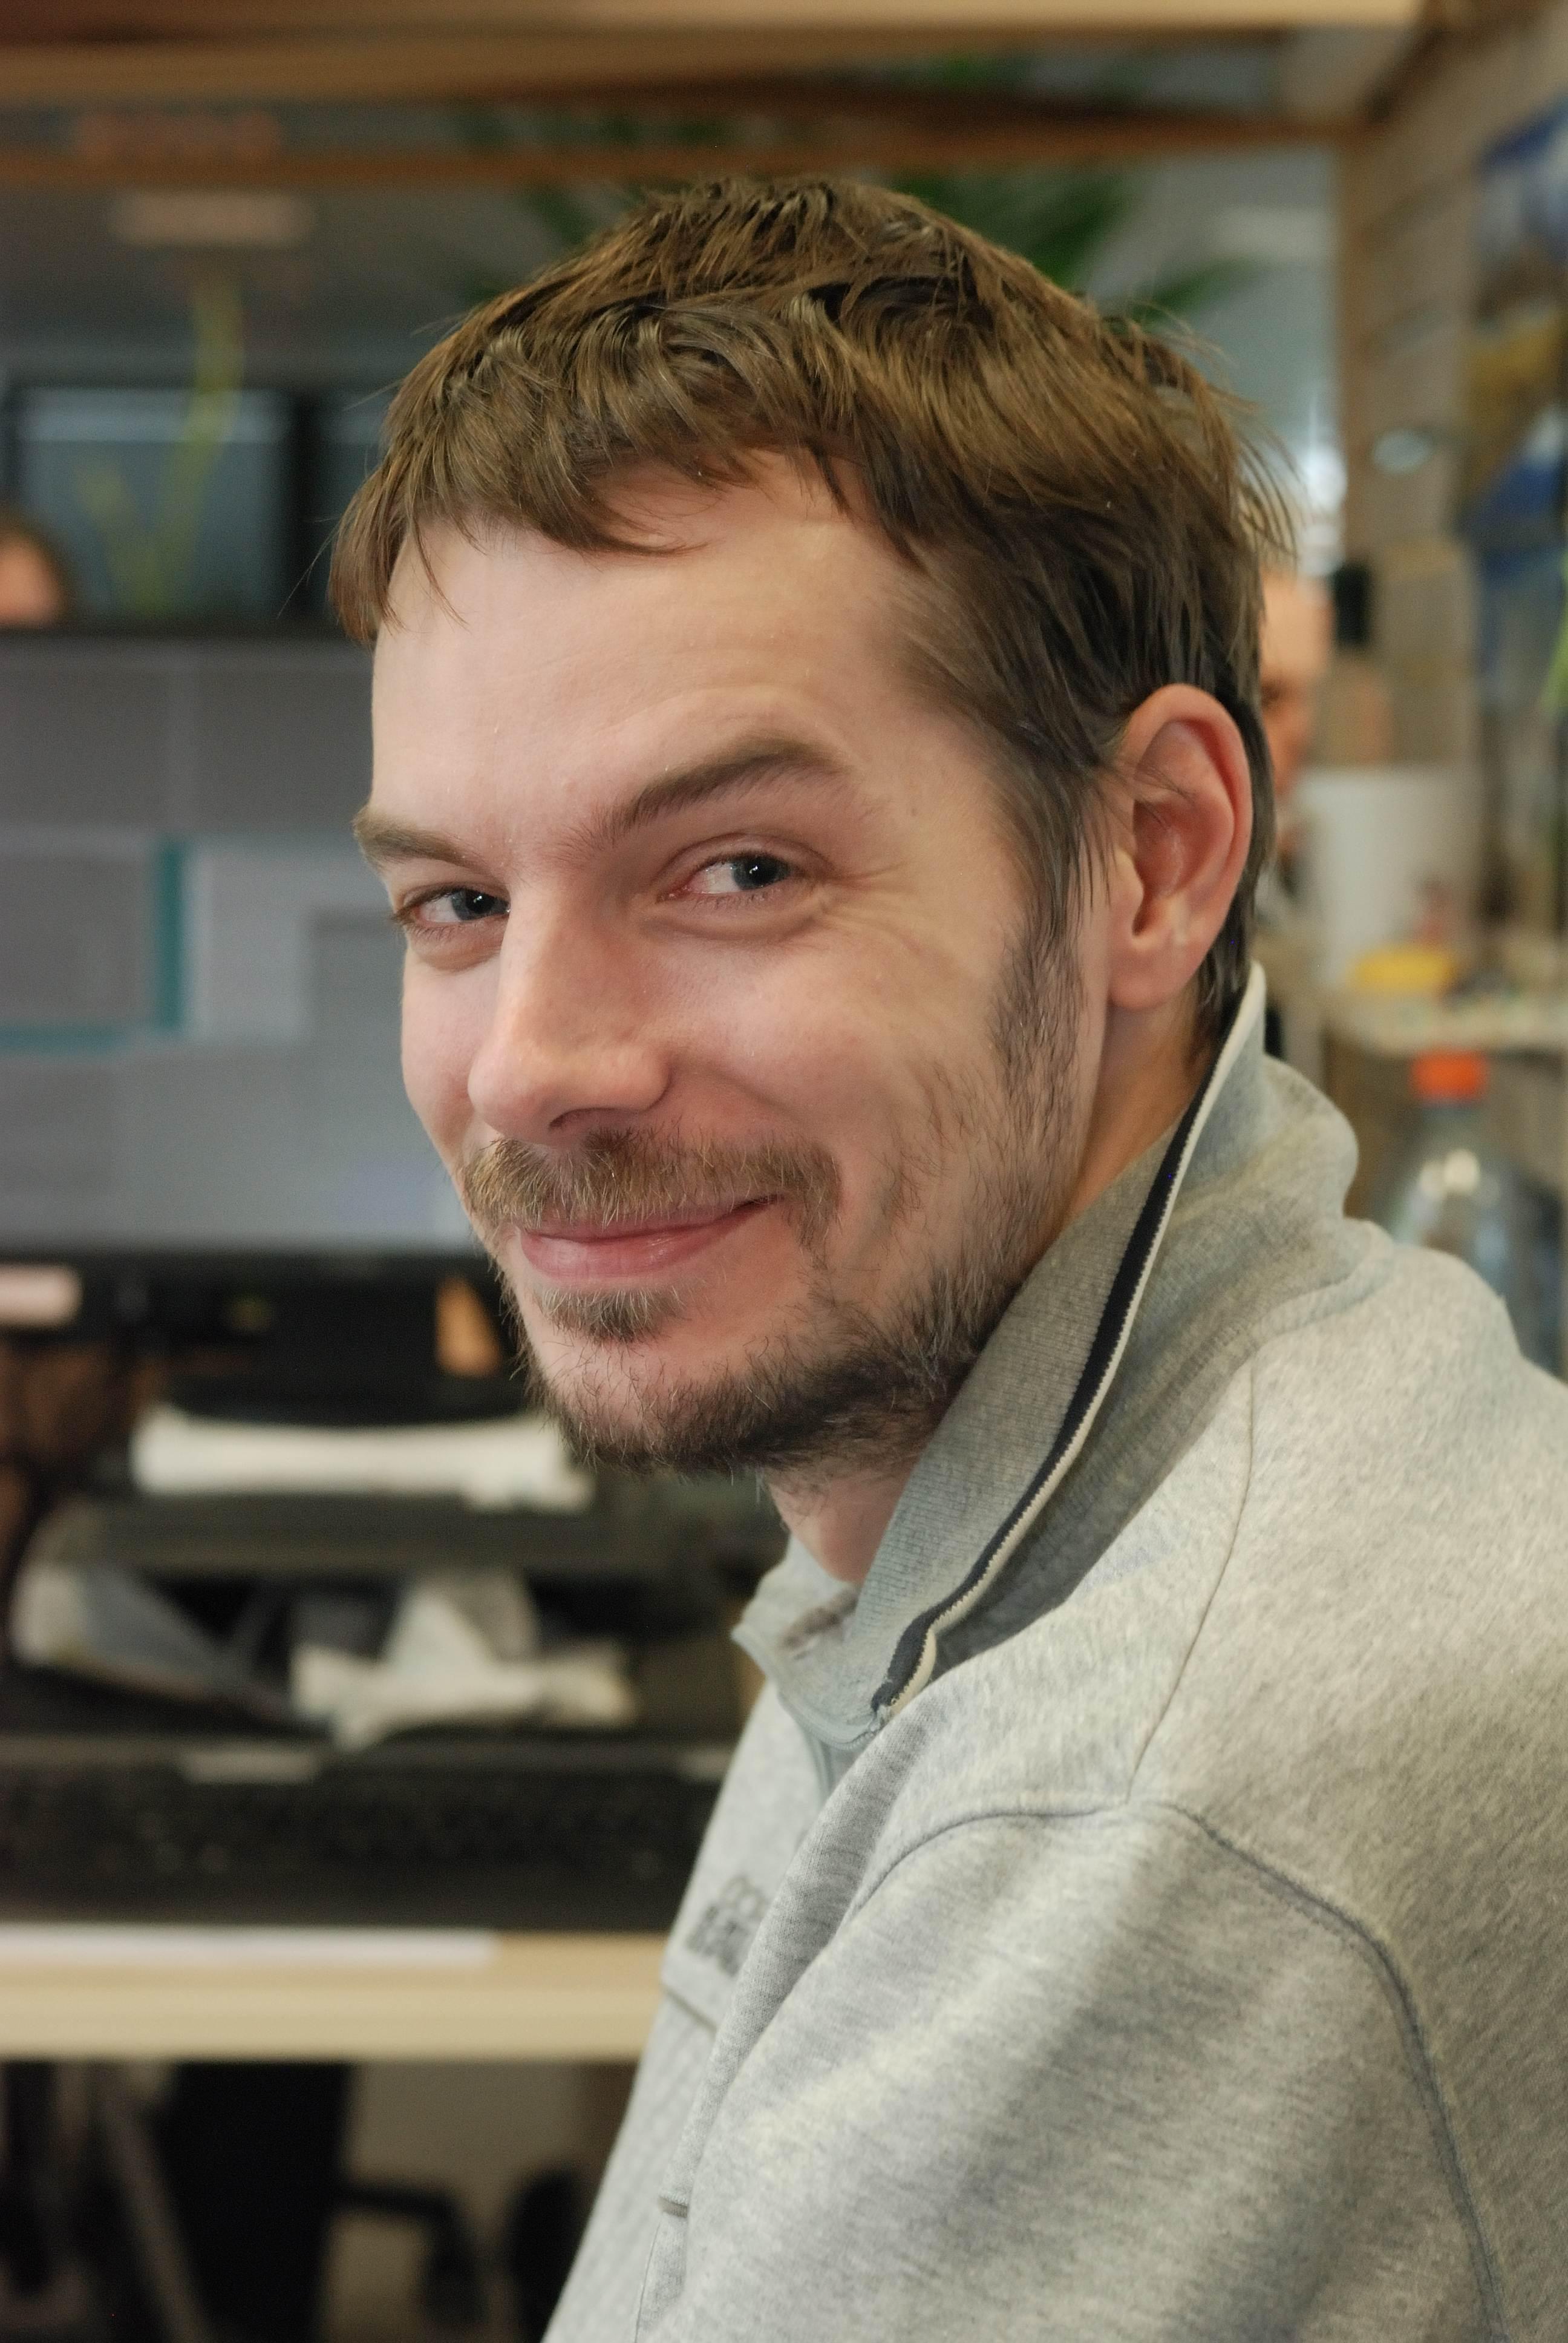 Vyzkumnik strojoveho uceni Vladimir Kadlec